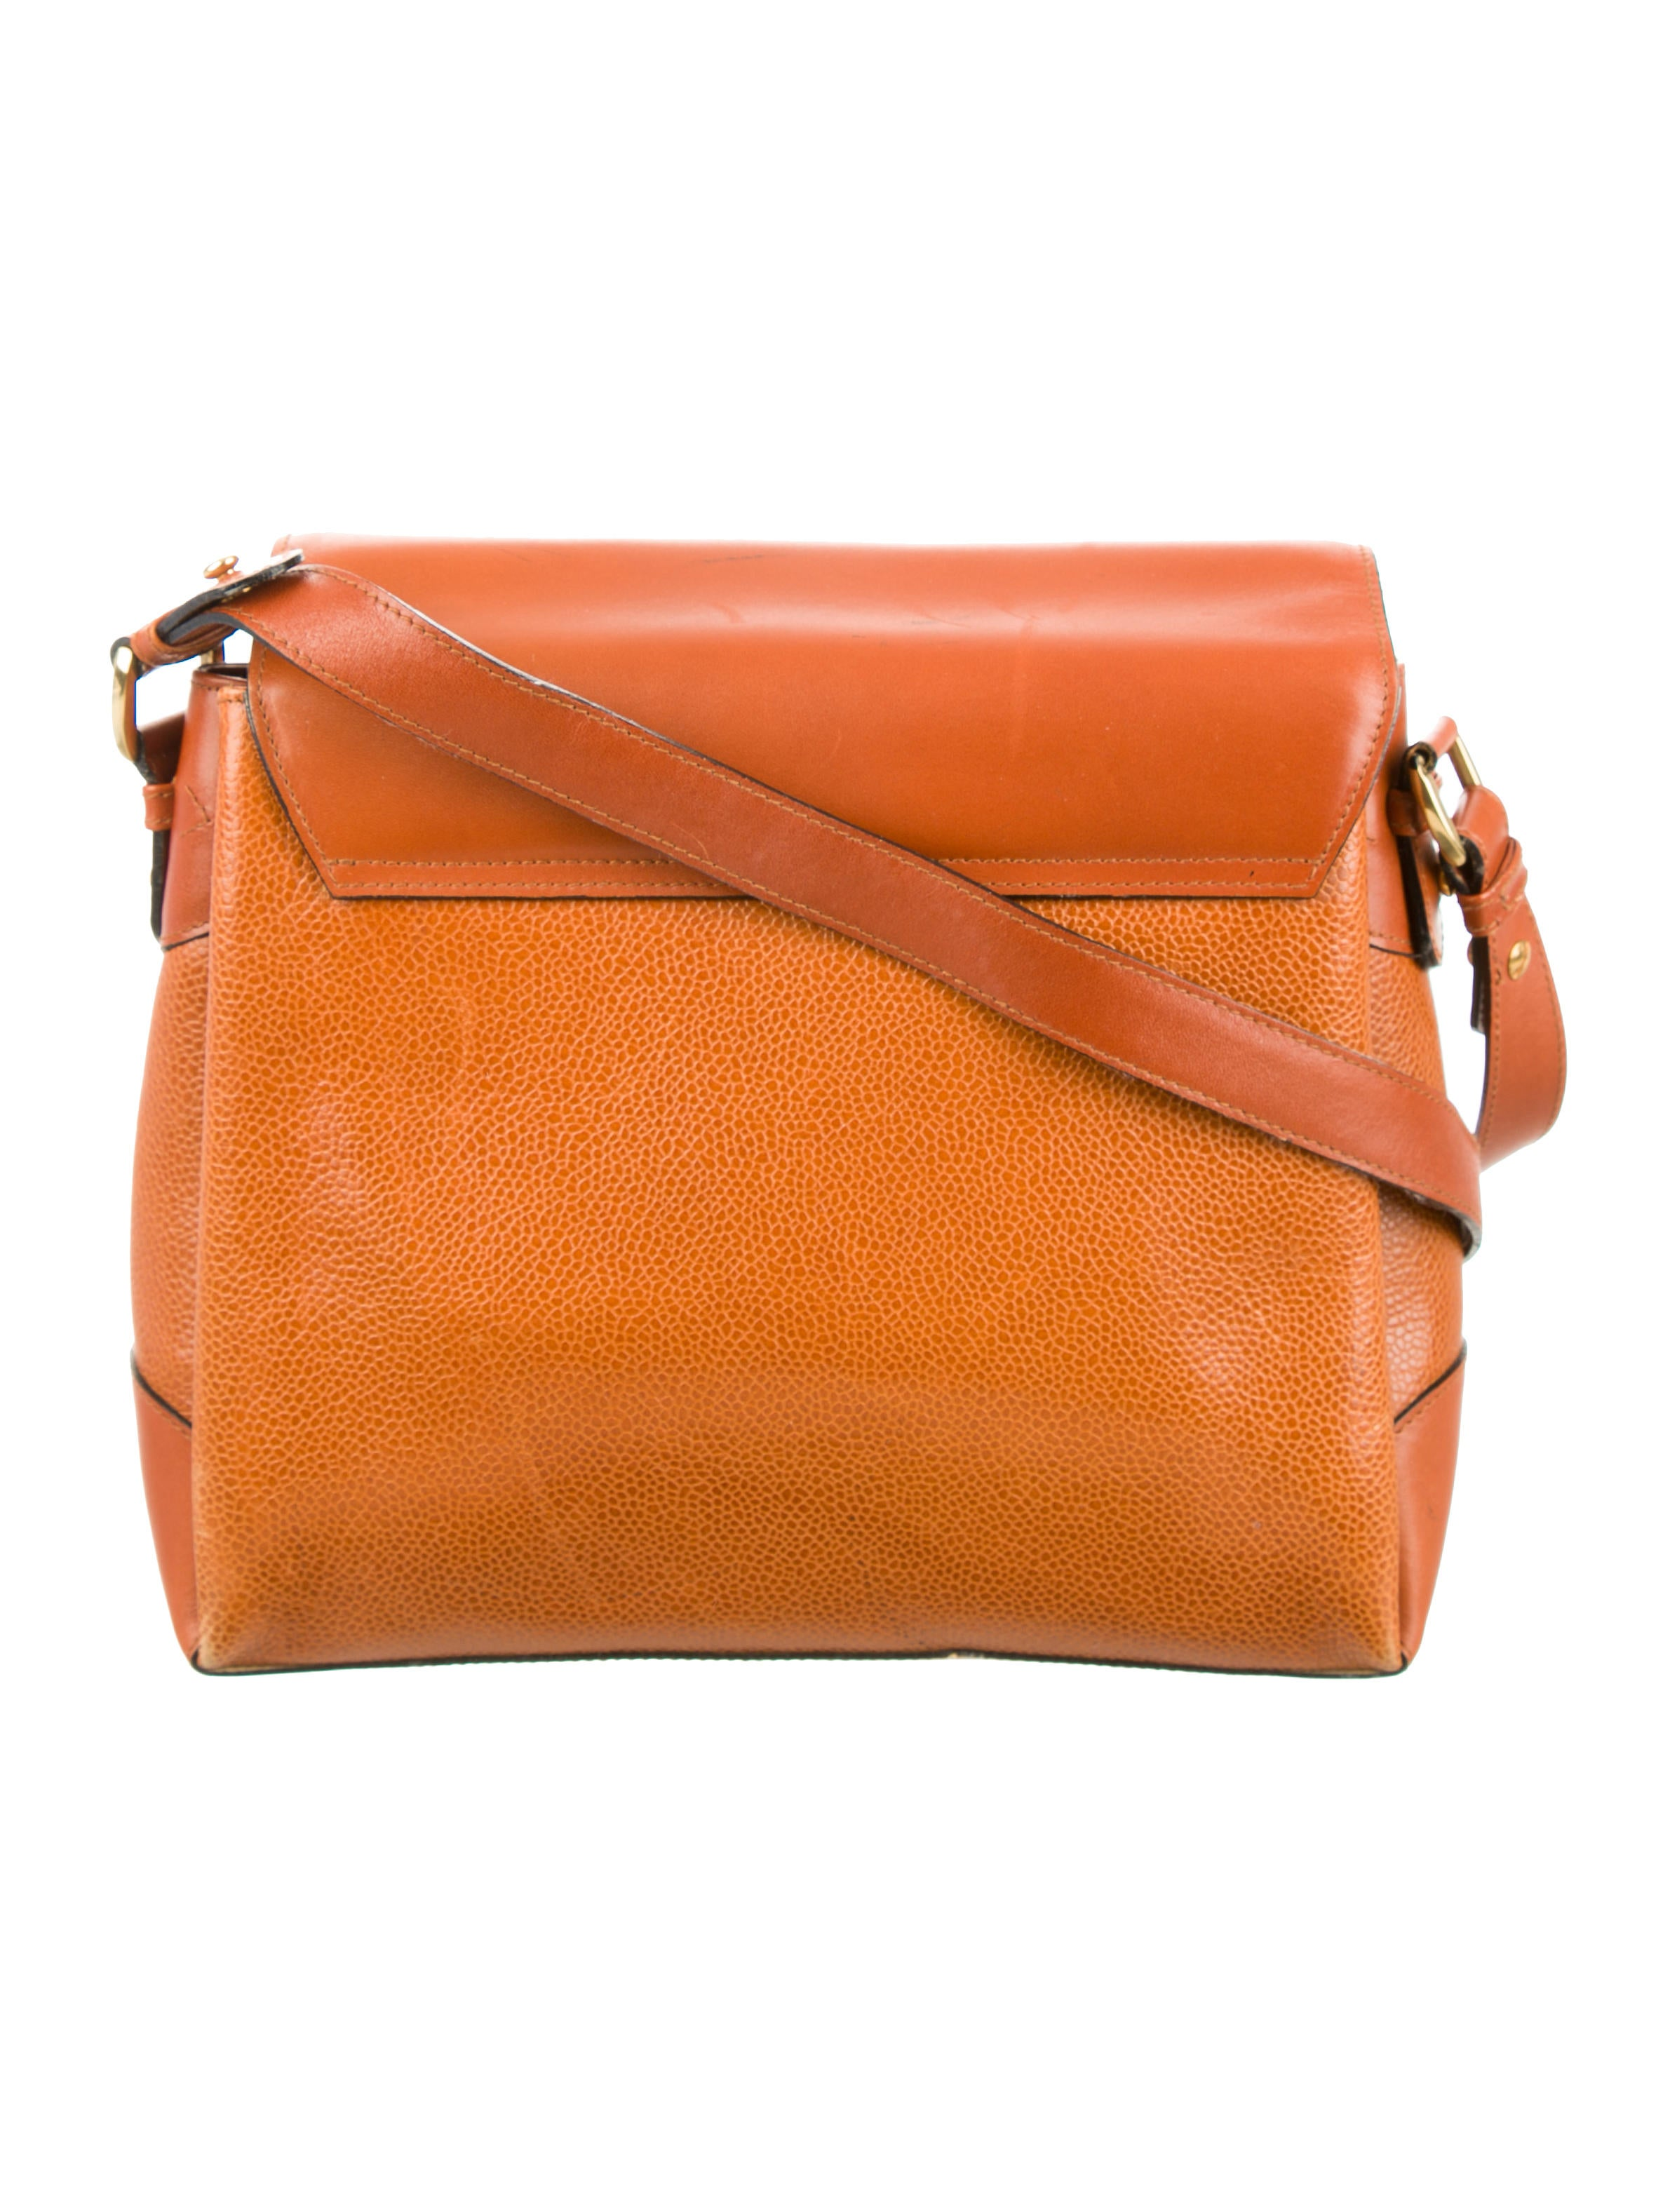 Black Pebbled Leather Crossbody Bag 24